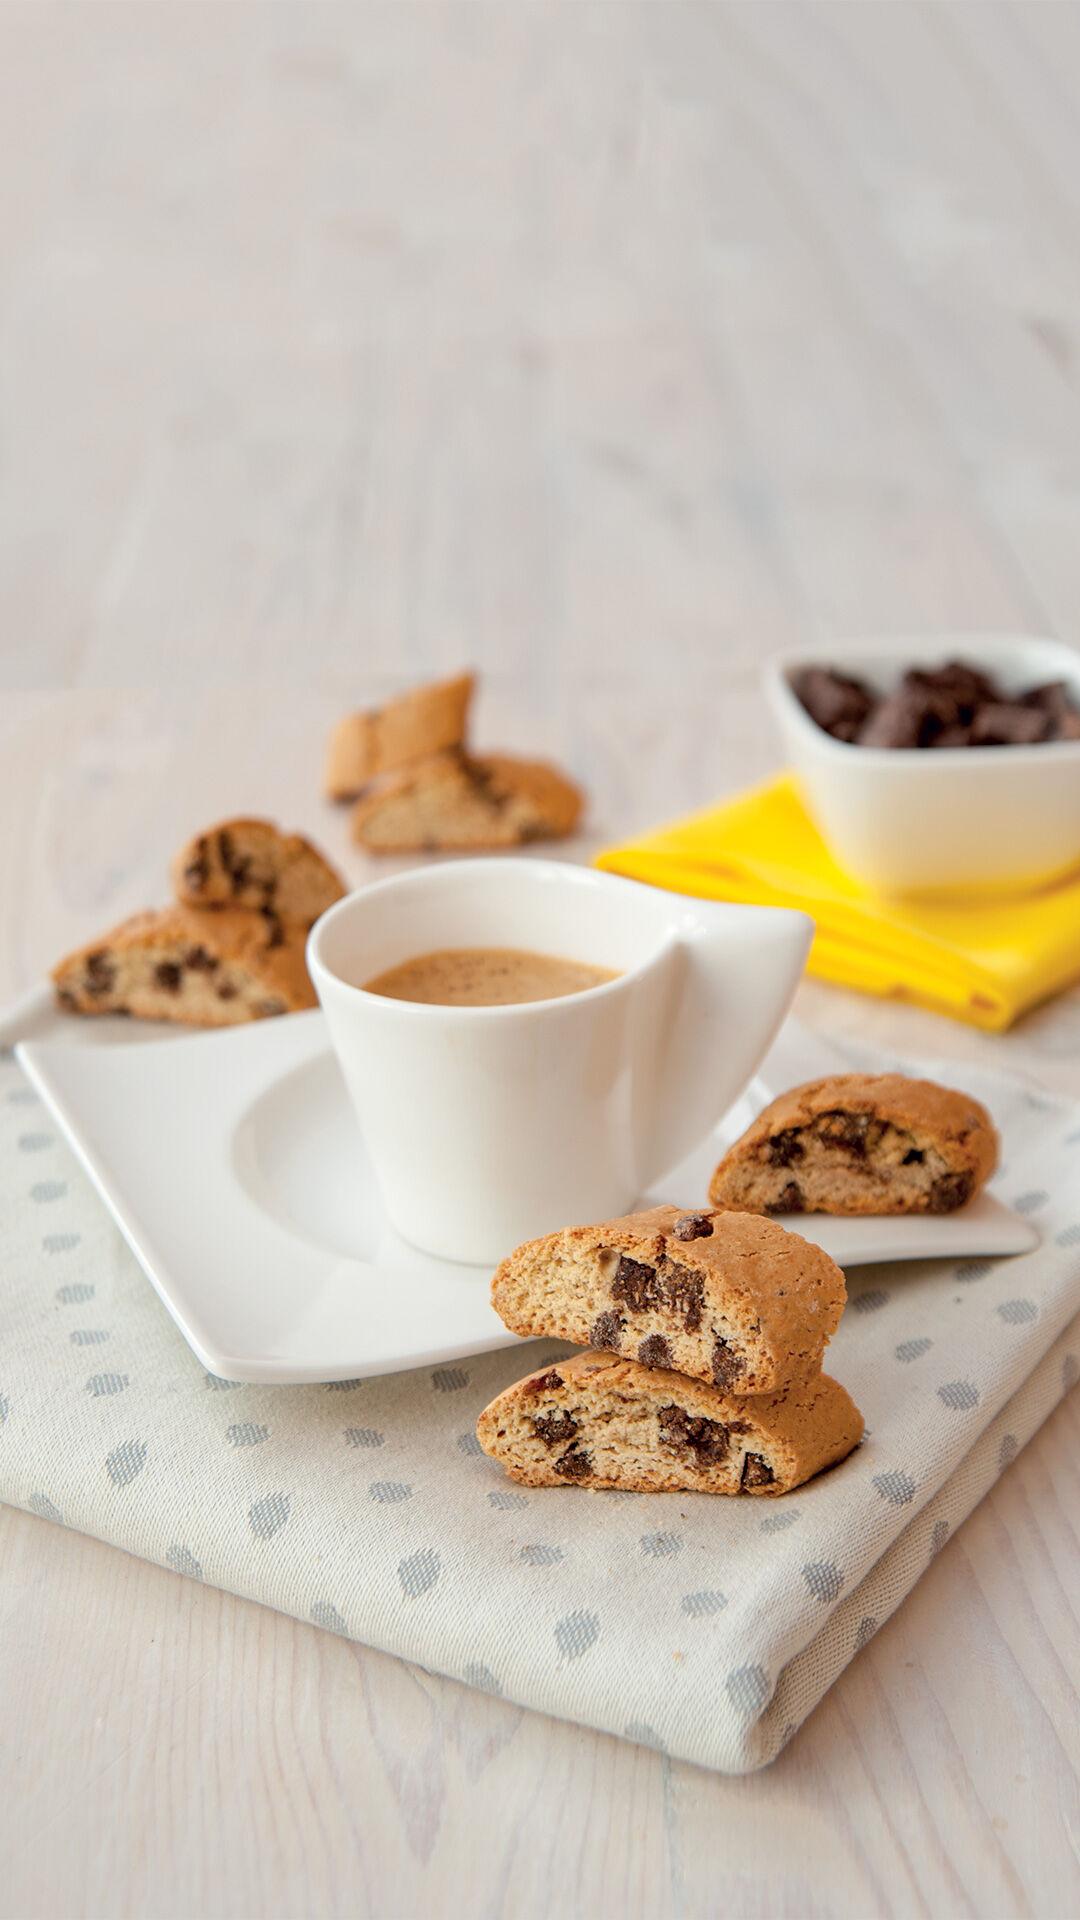 CNC - Cantuccini Mit Schokolade